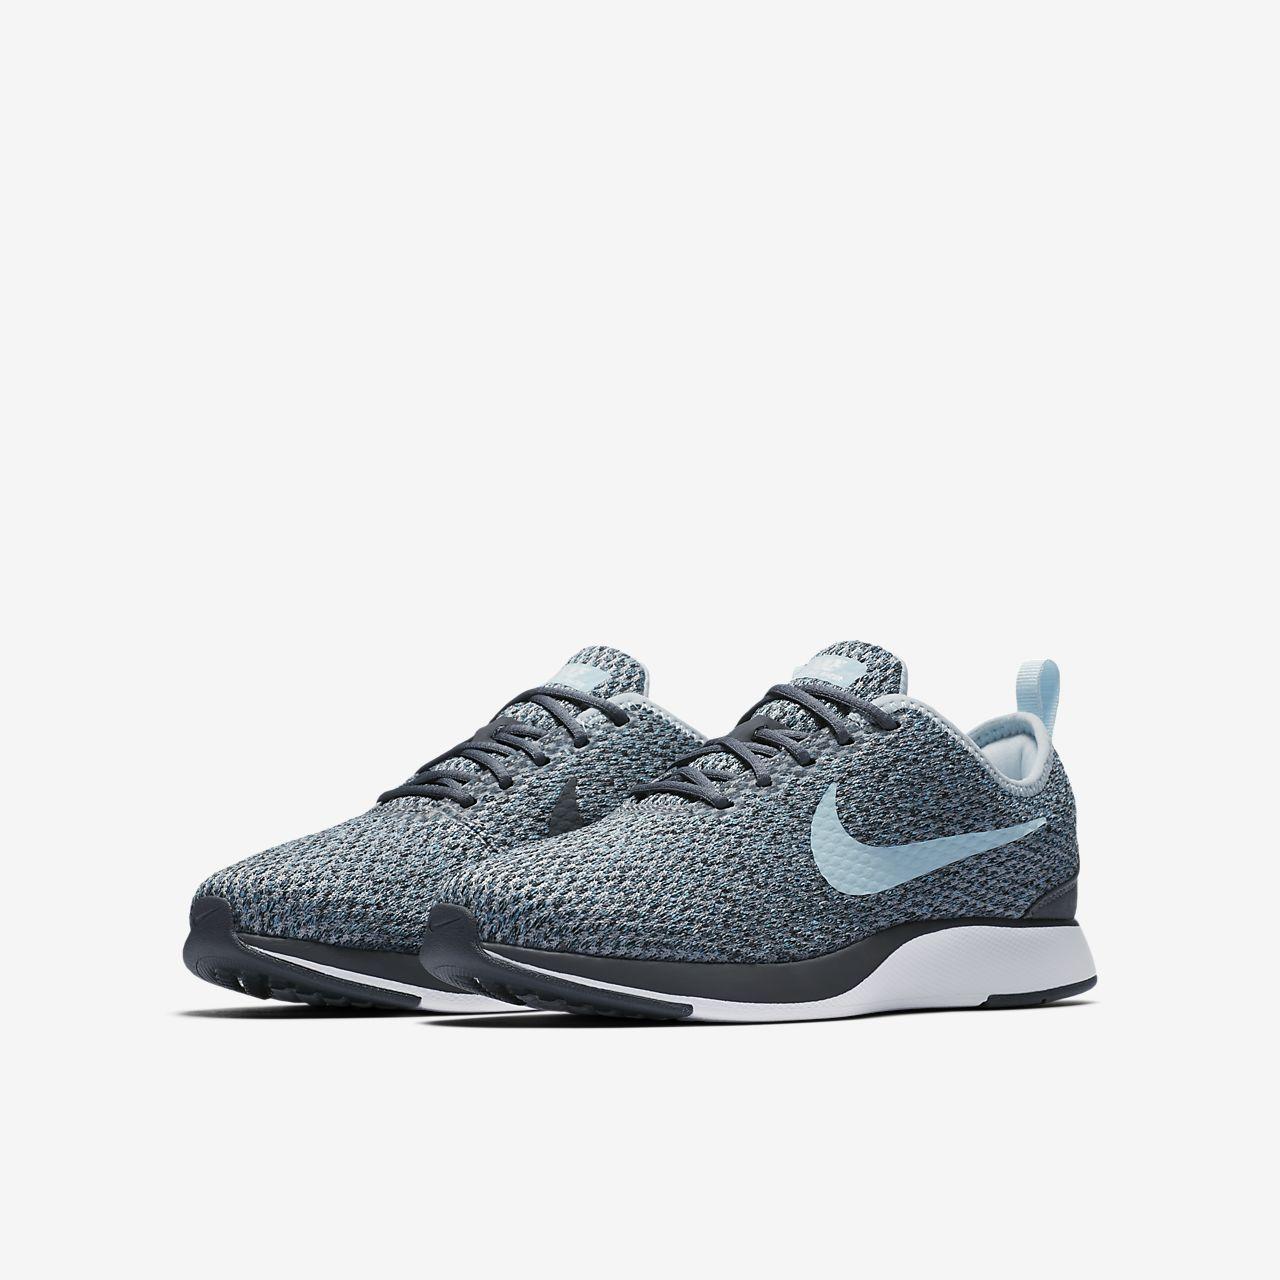 Zapatillas deportivas de hombre Dualtone Racer SE Nike... NmrFKCS